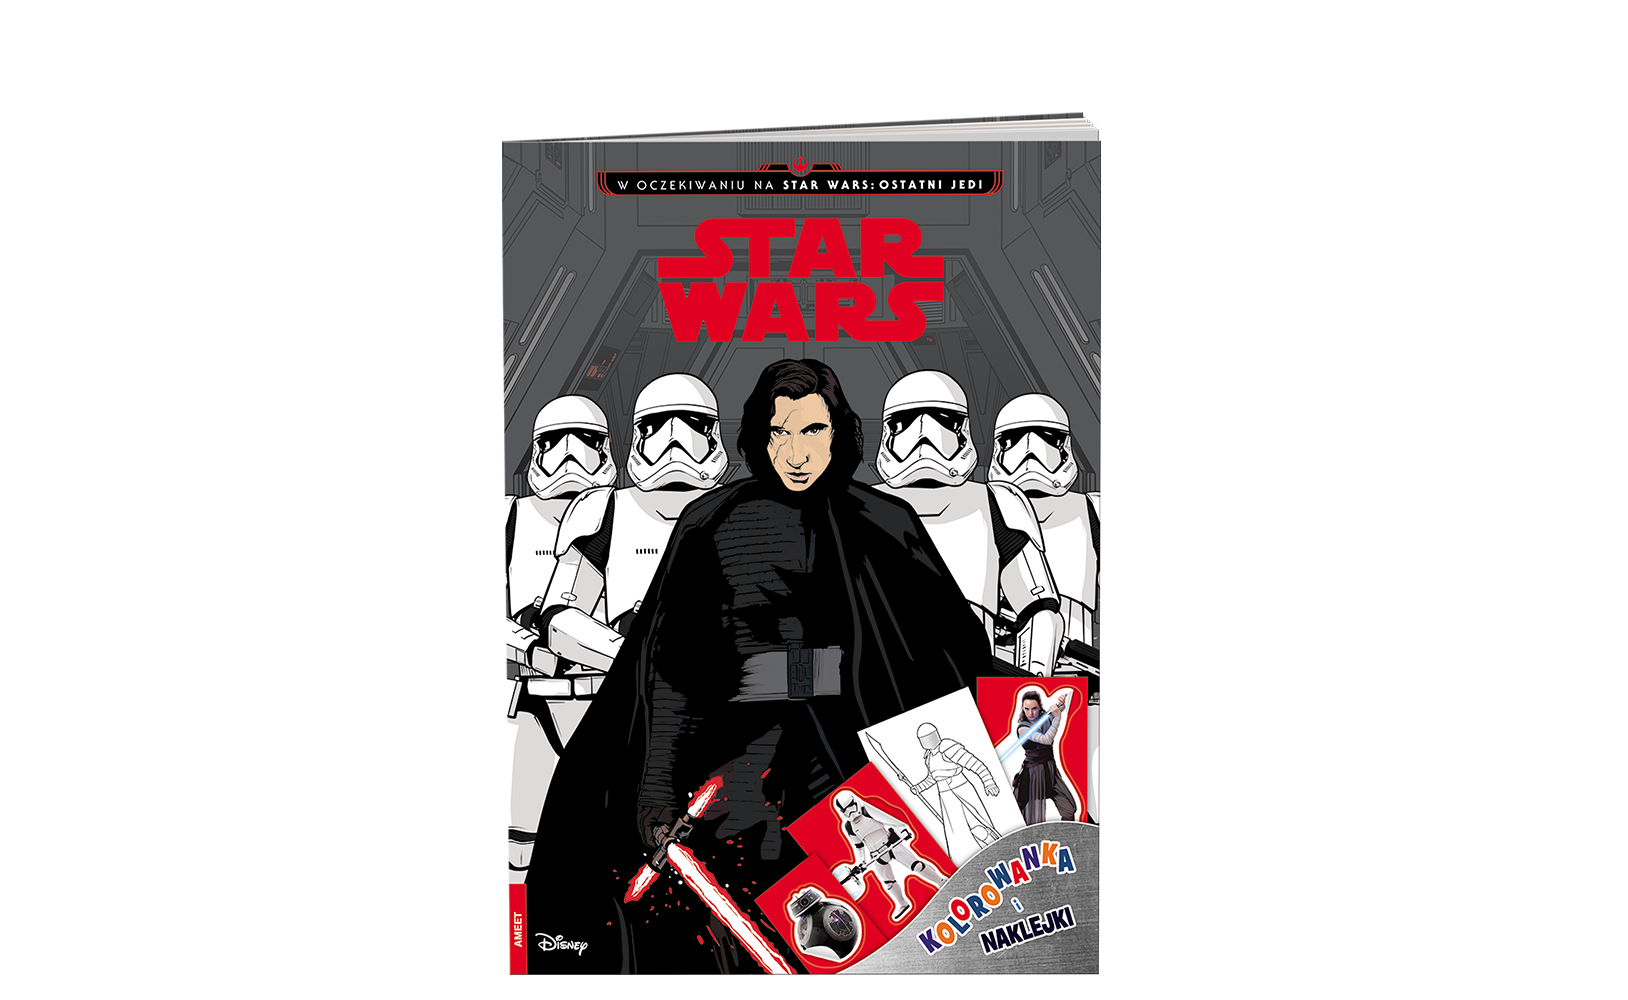 Star Wars™. Kolorowanka inaklejki